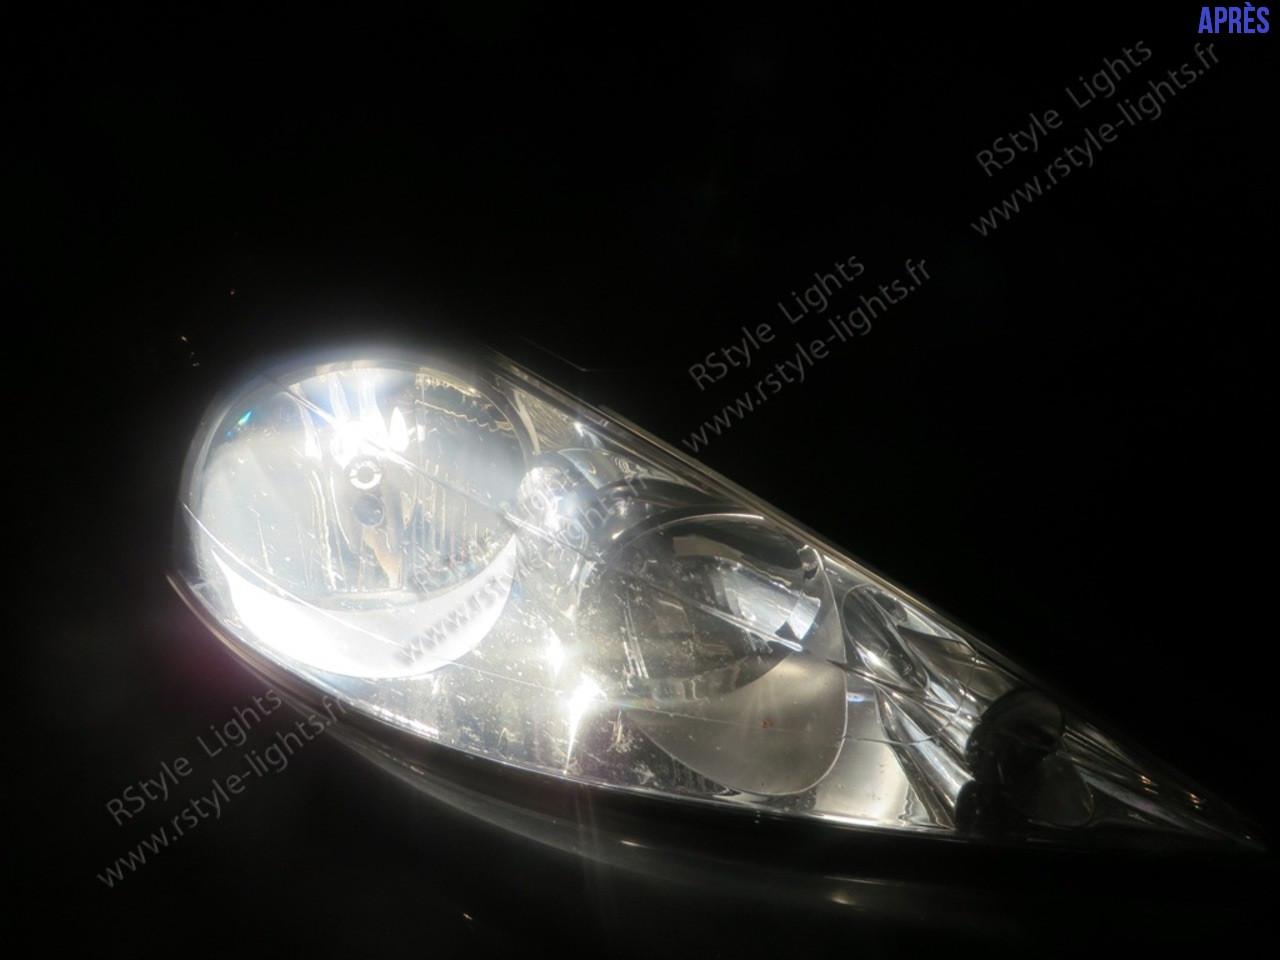 pack 2 ampoules h7 xenon effect ampoules 12v auto moto. Black Bedroom Furniture Sets. Home Design Ideas